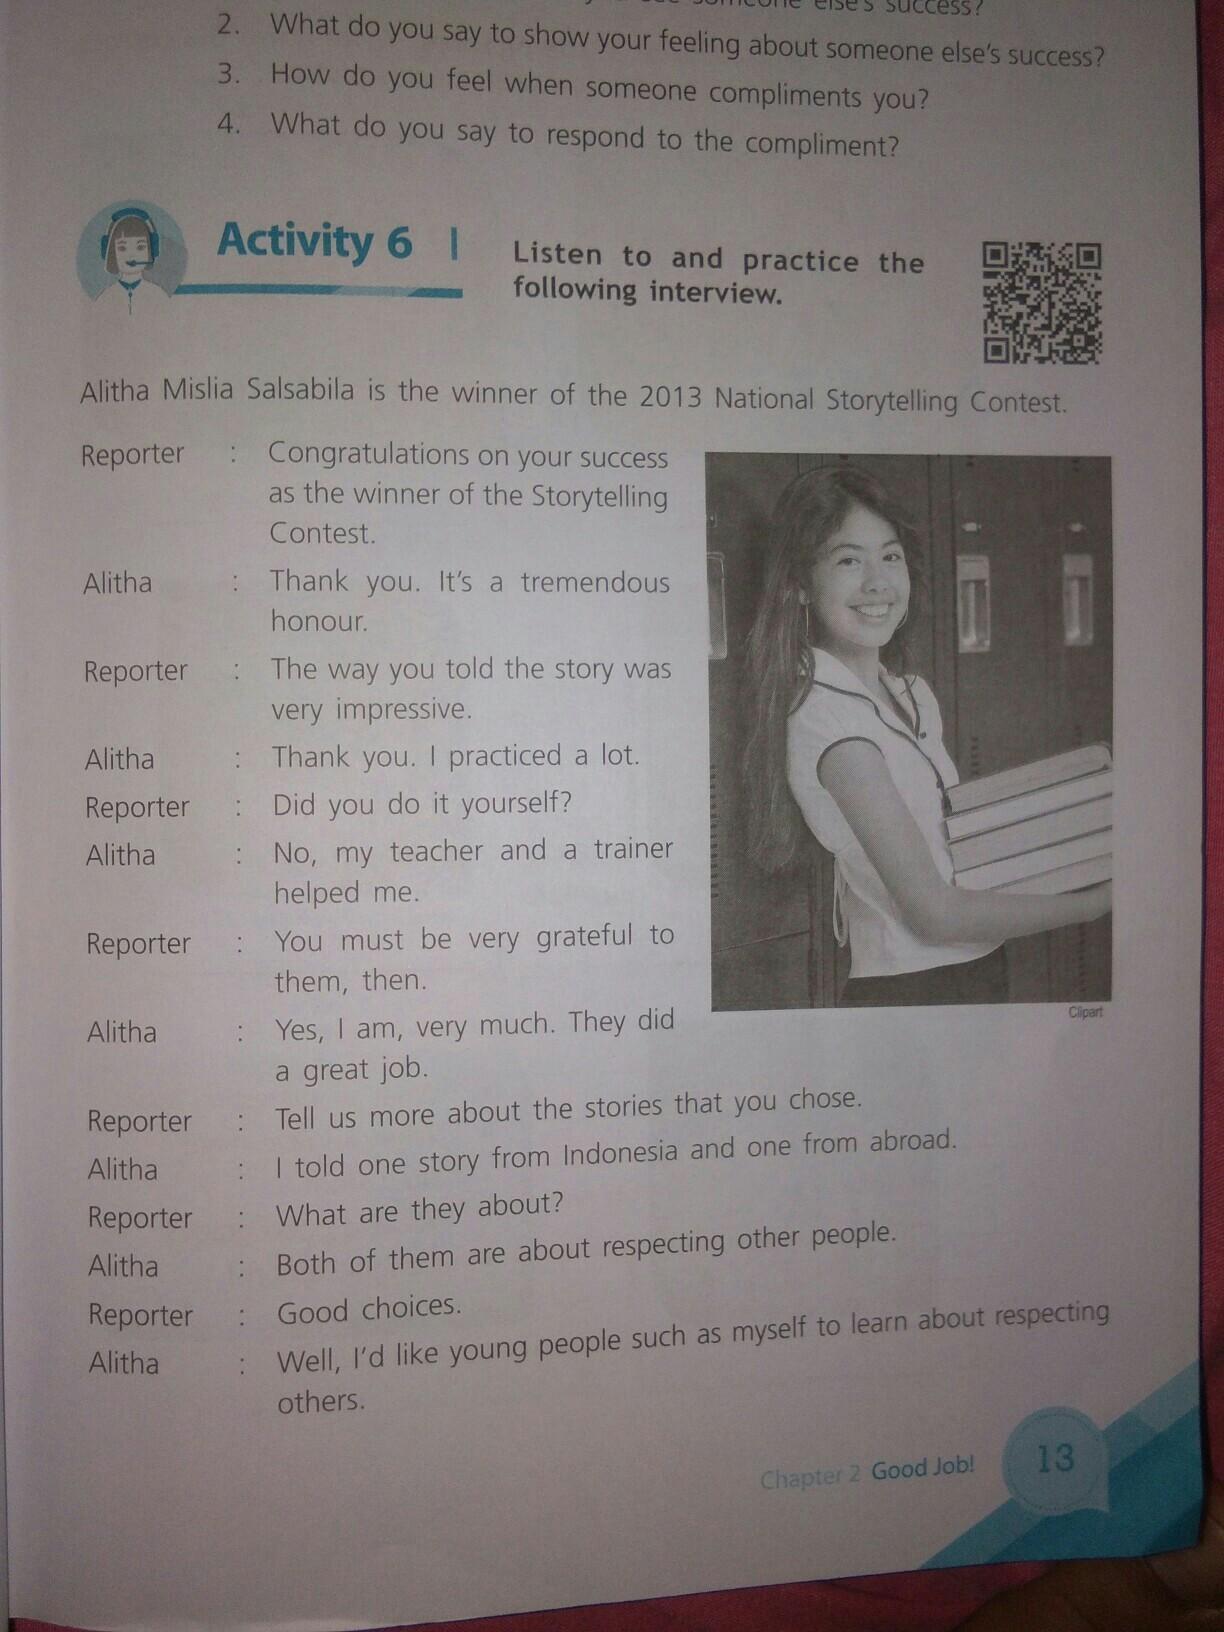 Bahasa Inggris Adik Perempuan : bahasa, inggris, perempuan, Buatkan, Dialog, Bahasa, Inggris, Tentang, Saudara, Perempuan, Memenangkan, Sebuah, Perlombaan, Brainly.co.id